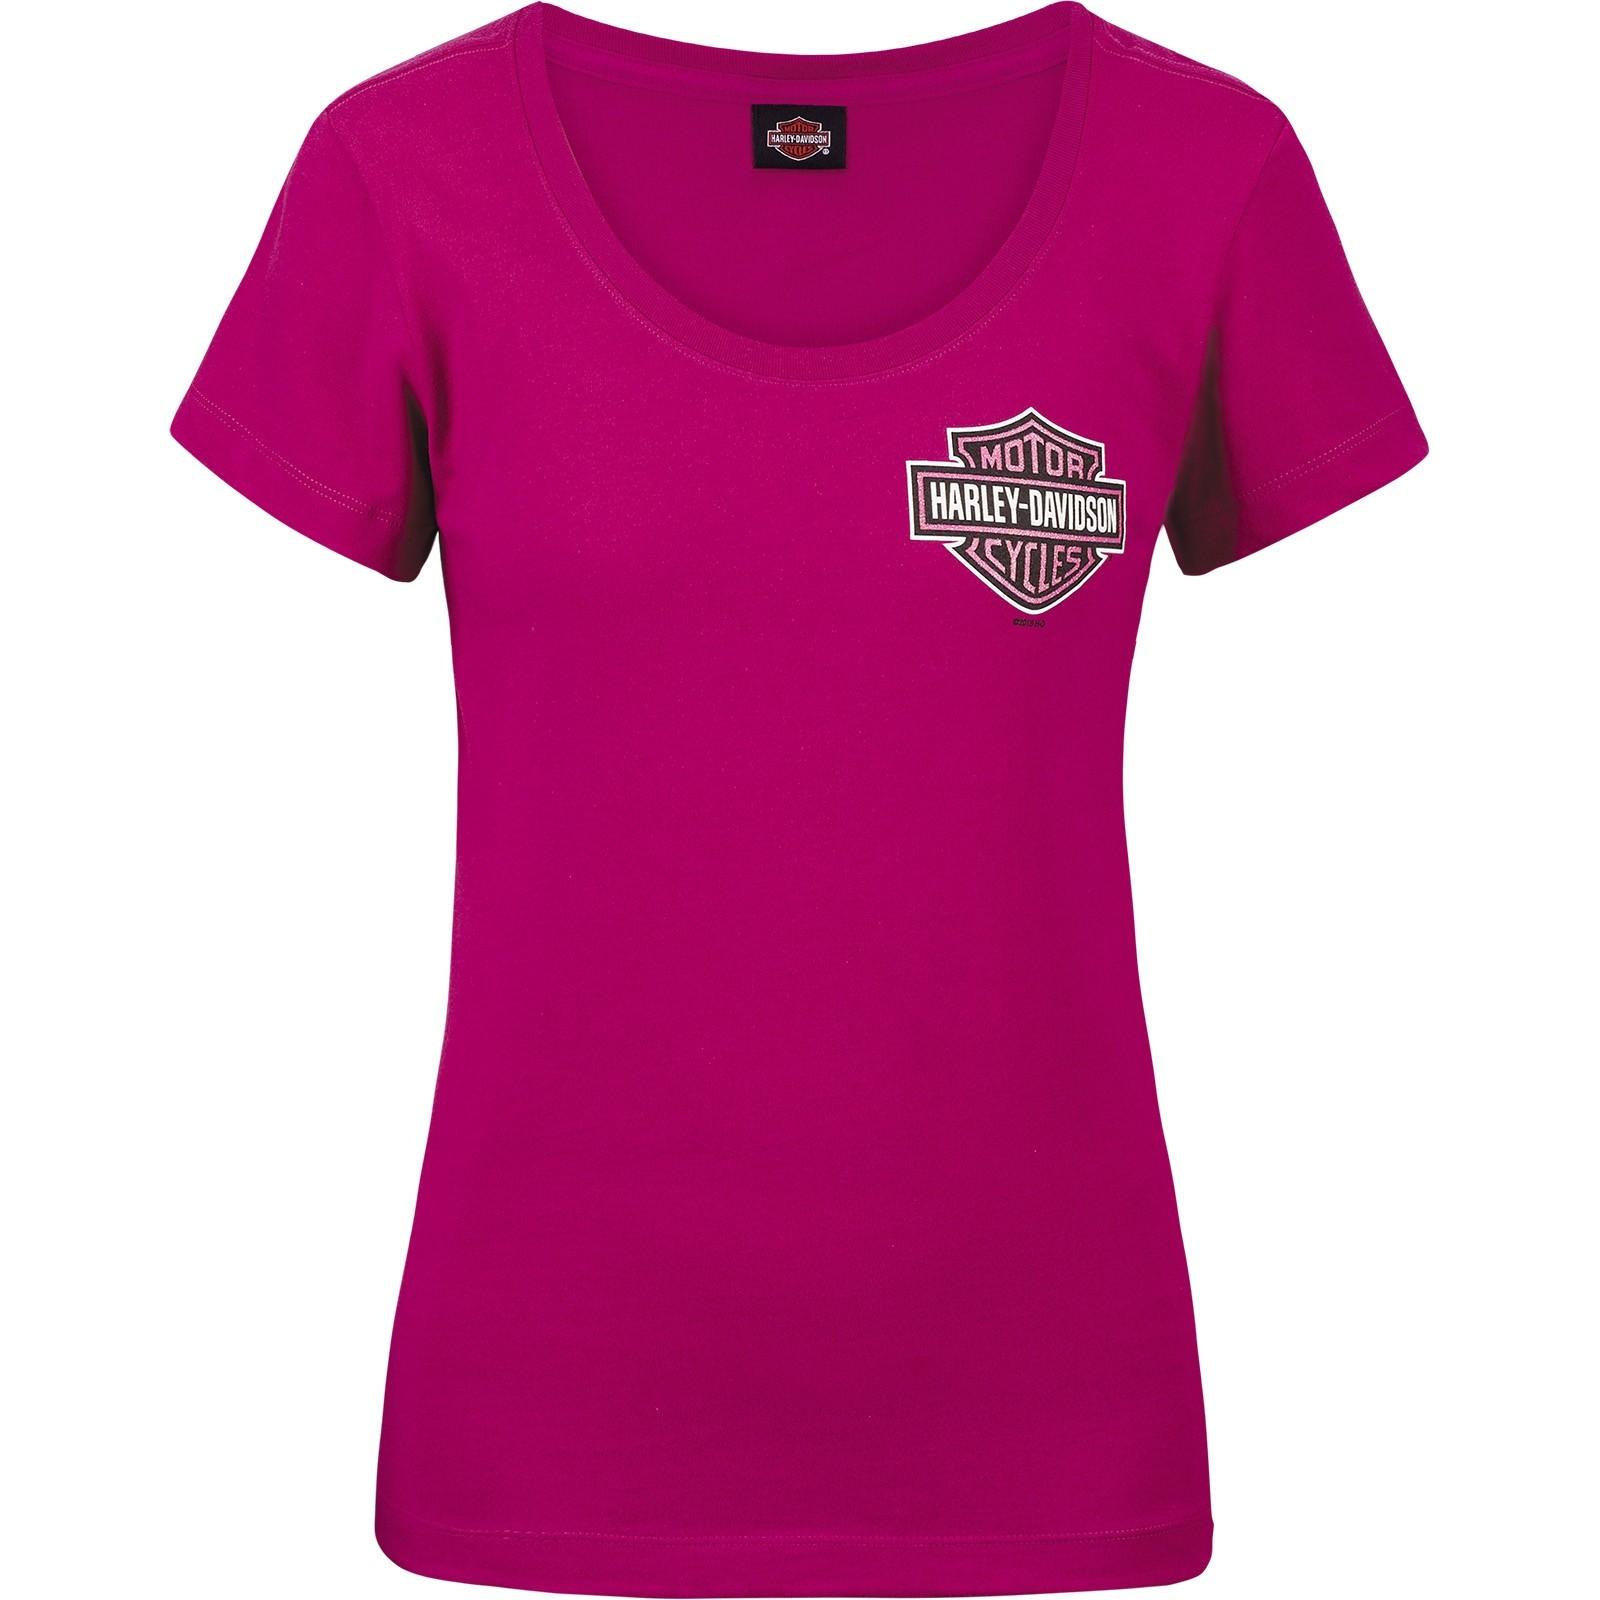 Harley-Davidson Military Women's Scoop Neck T-shirt - Aviano Air Base | Berry Logo